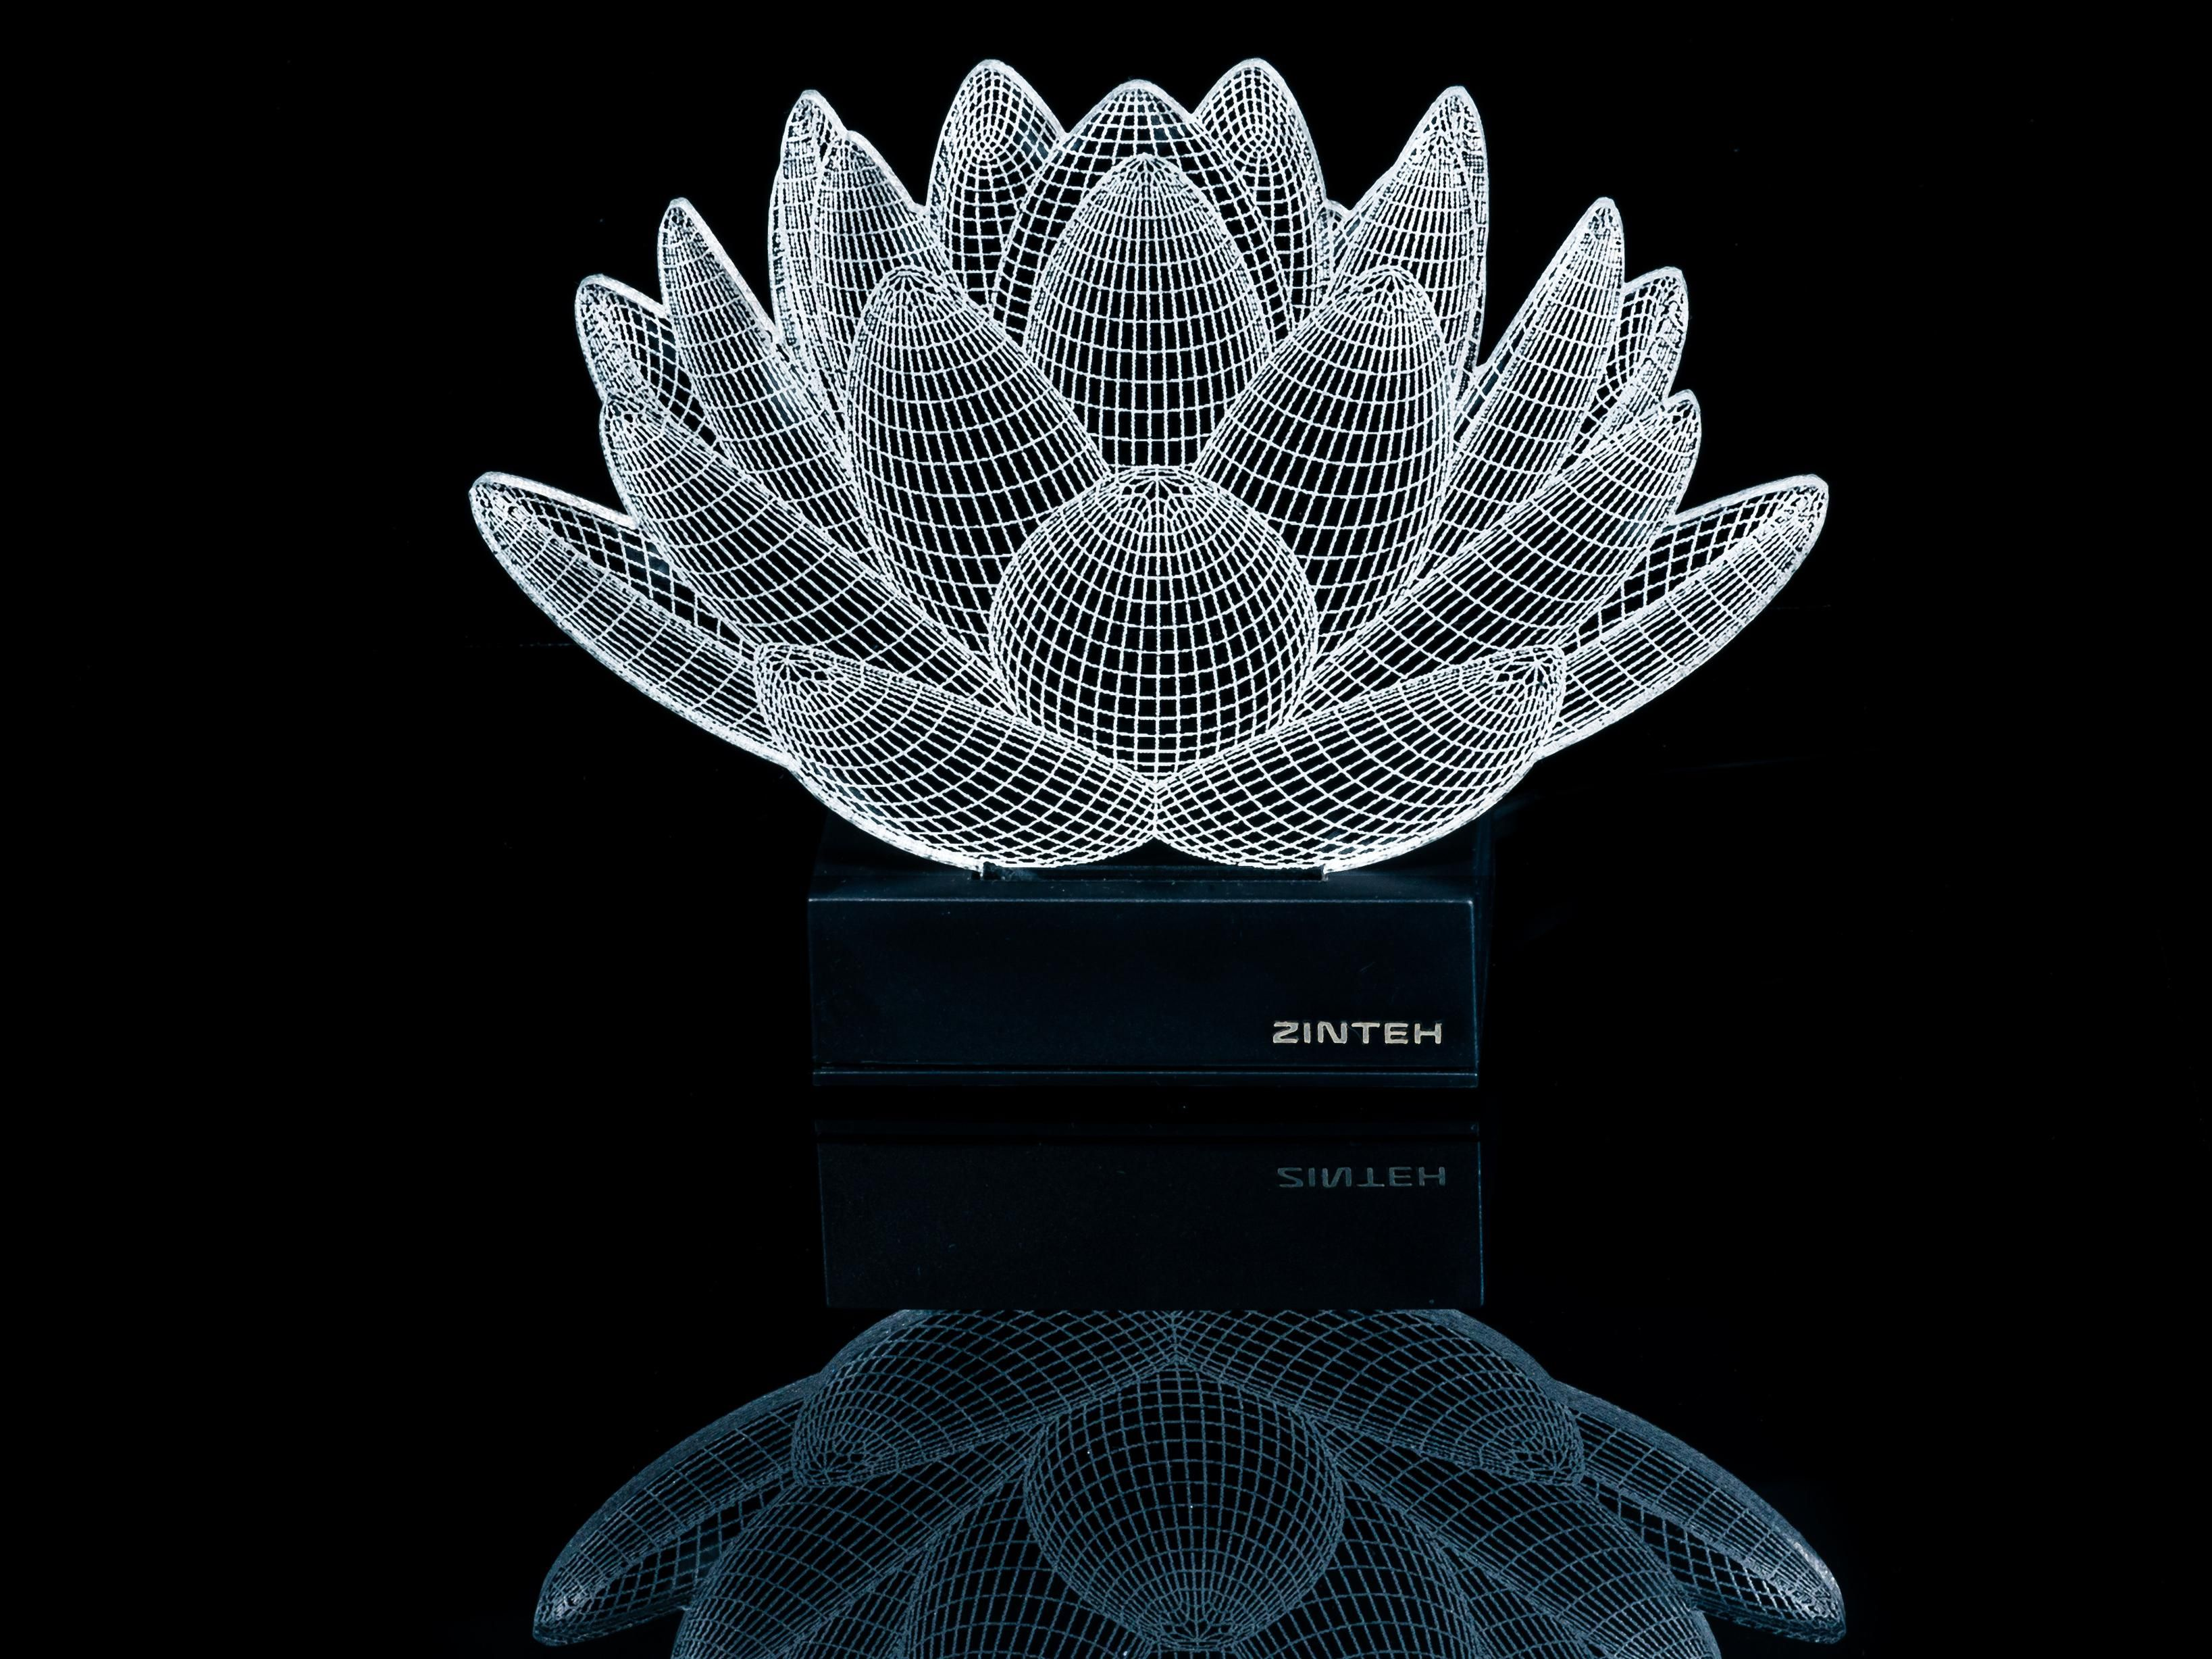 Lotus 3d Illusion Led Lamp Led Lamp Lamp 3d Optical Illusions